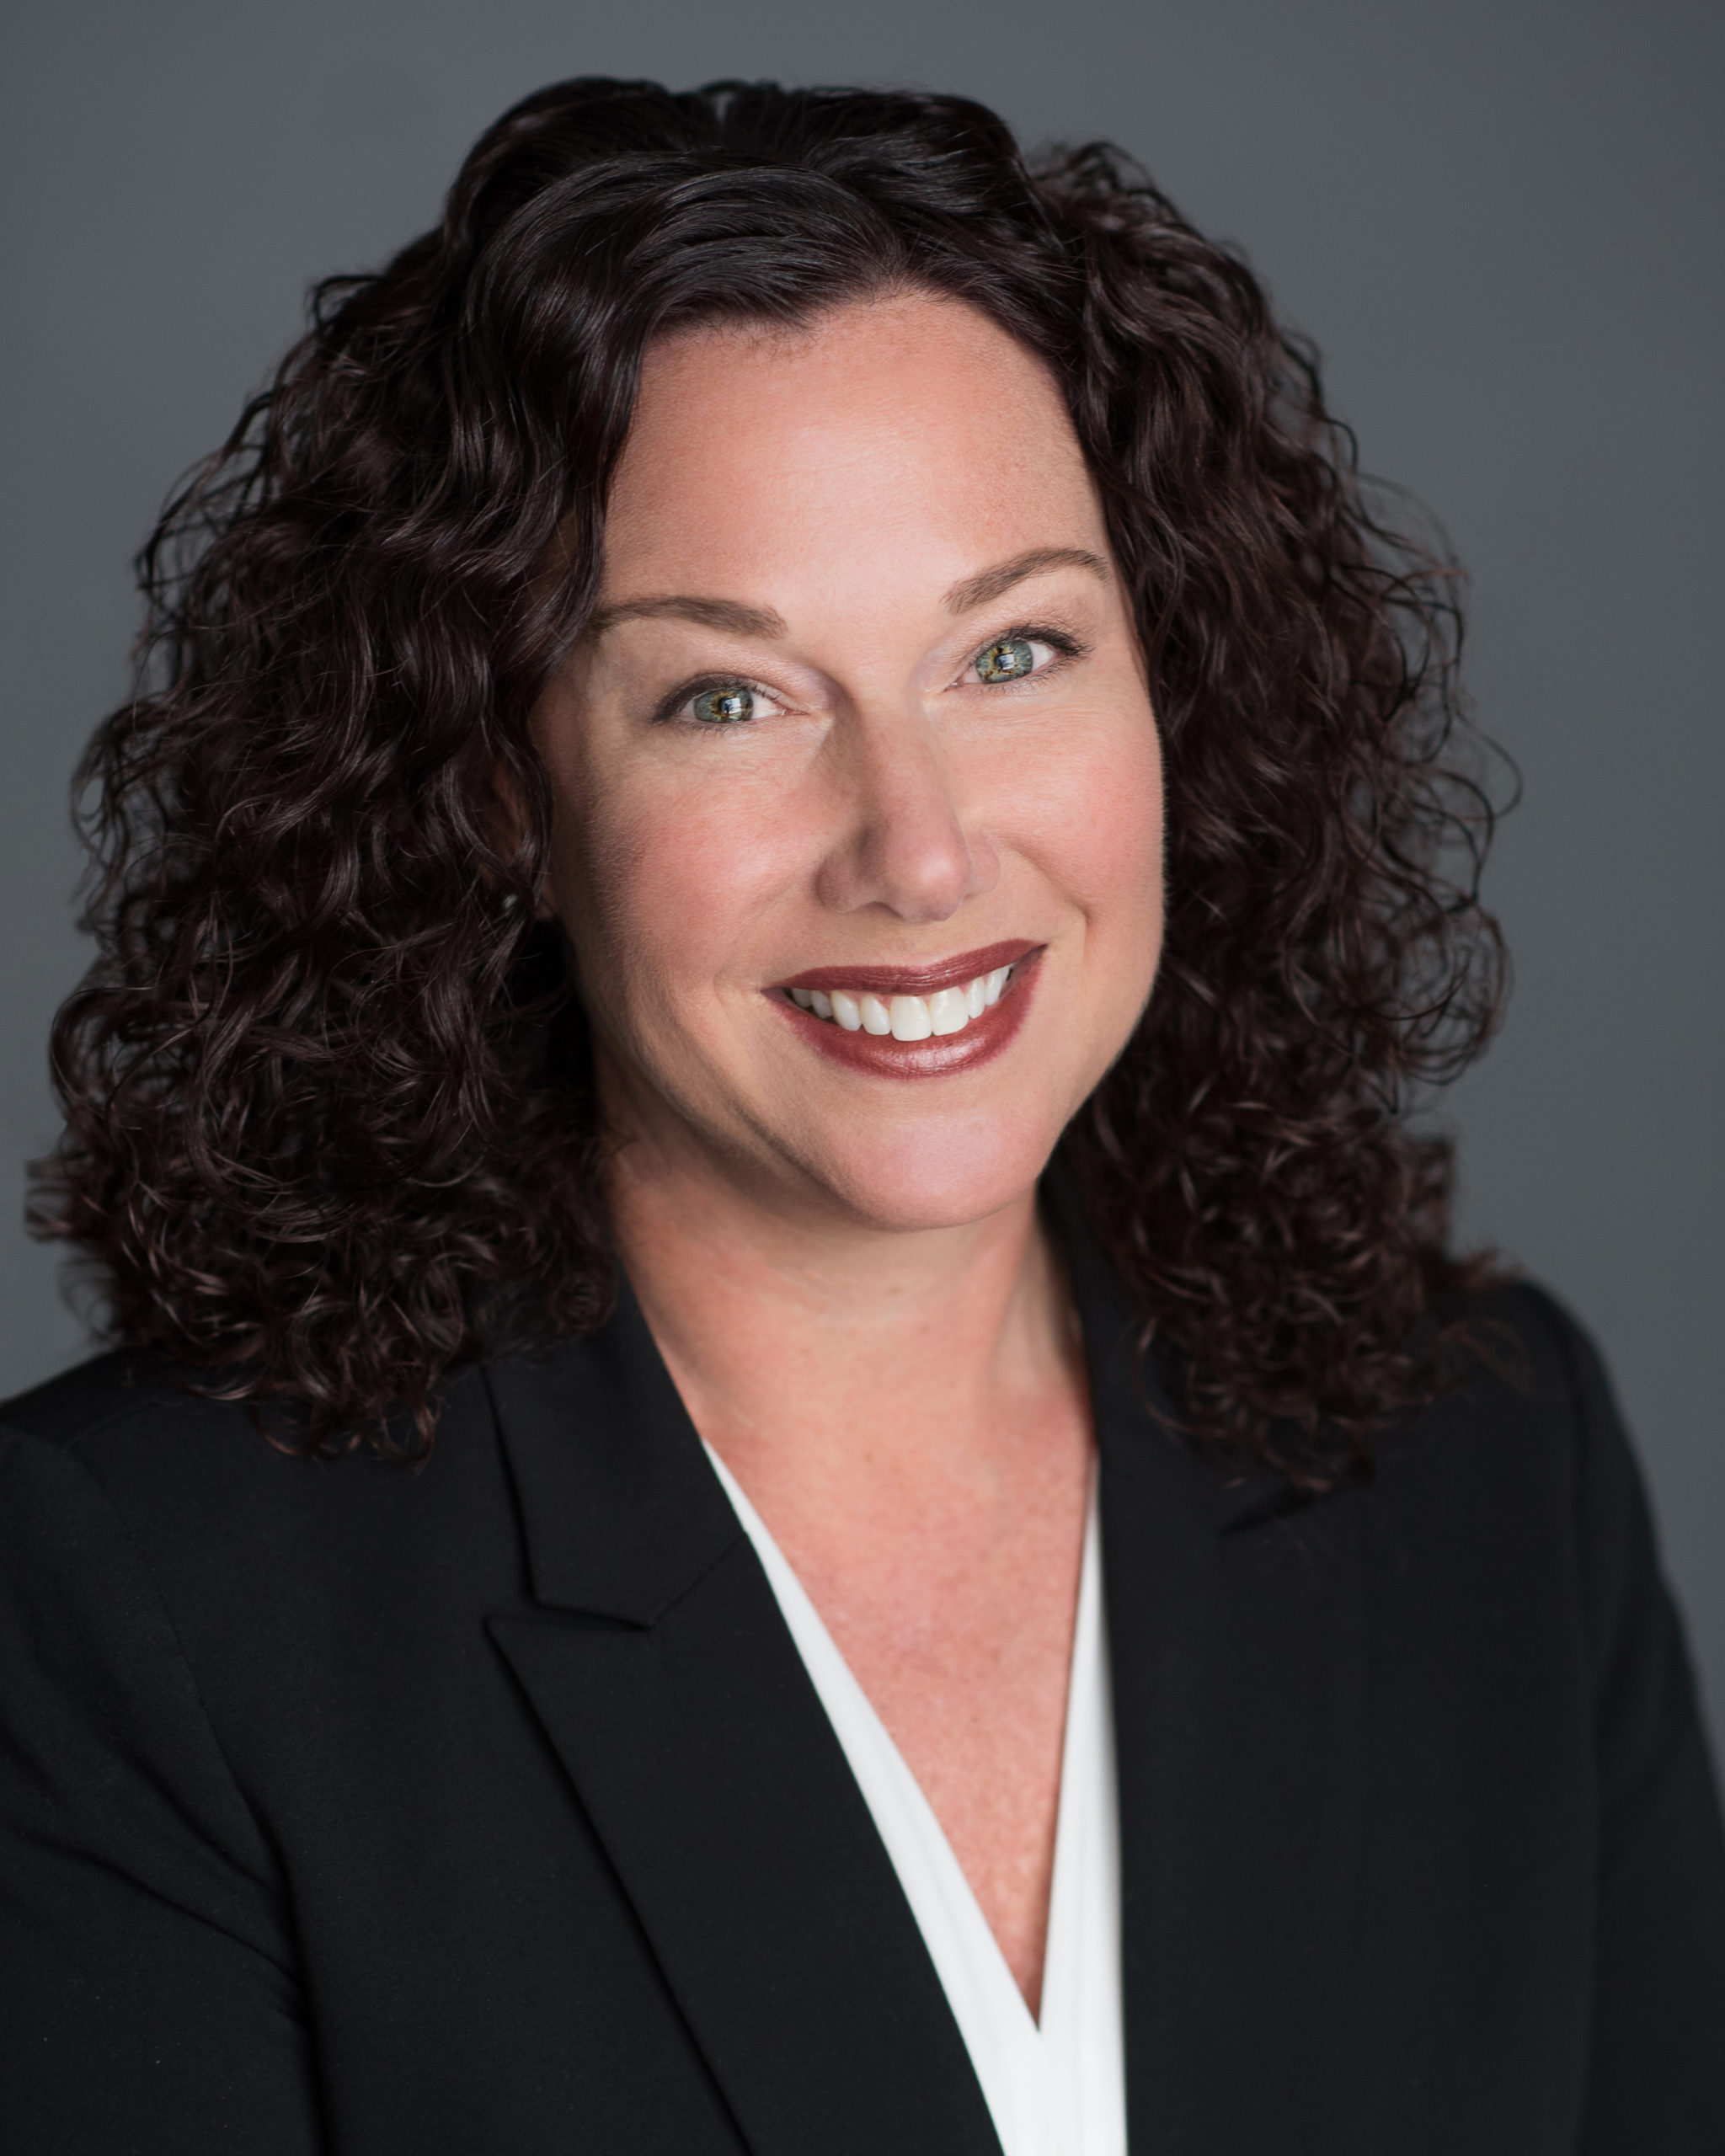 Dr. Sara Burdak